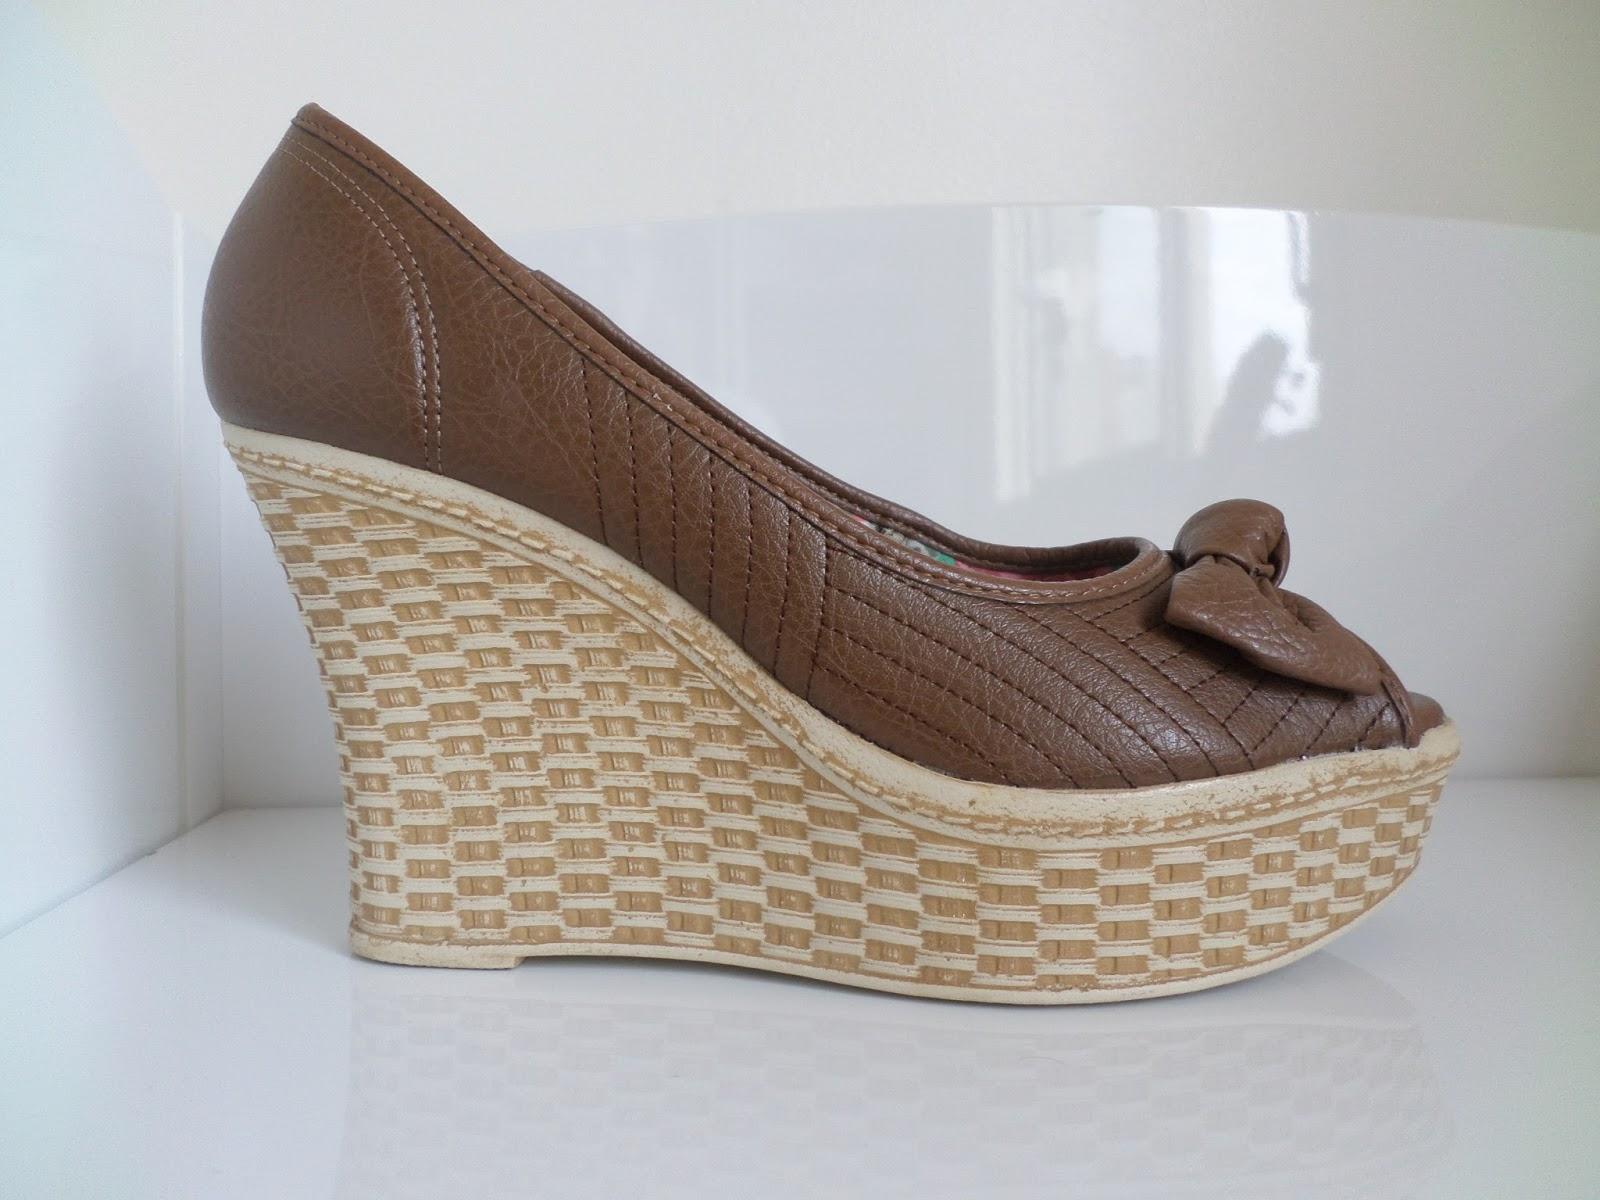 67cf978cc Sapato Peep Toe Azaleia, nº 36, salto anabela sem uso, cor marrom. R$ 40,00  + frete.